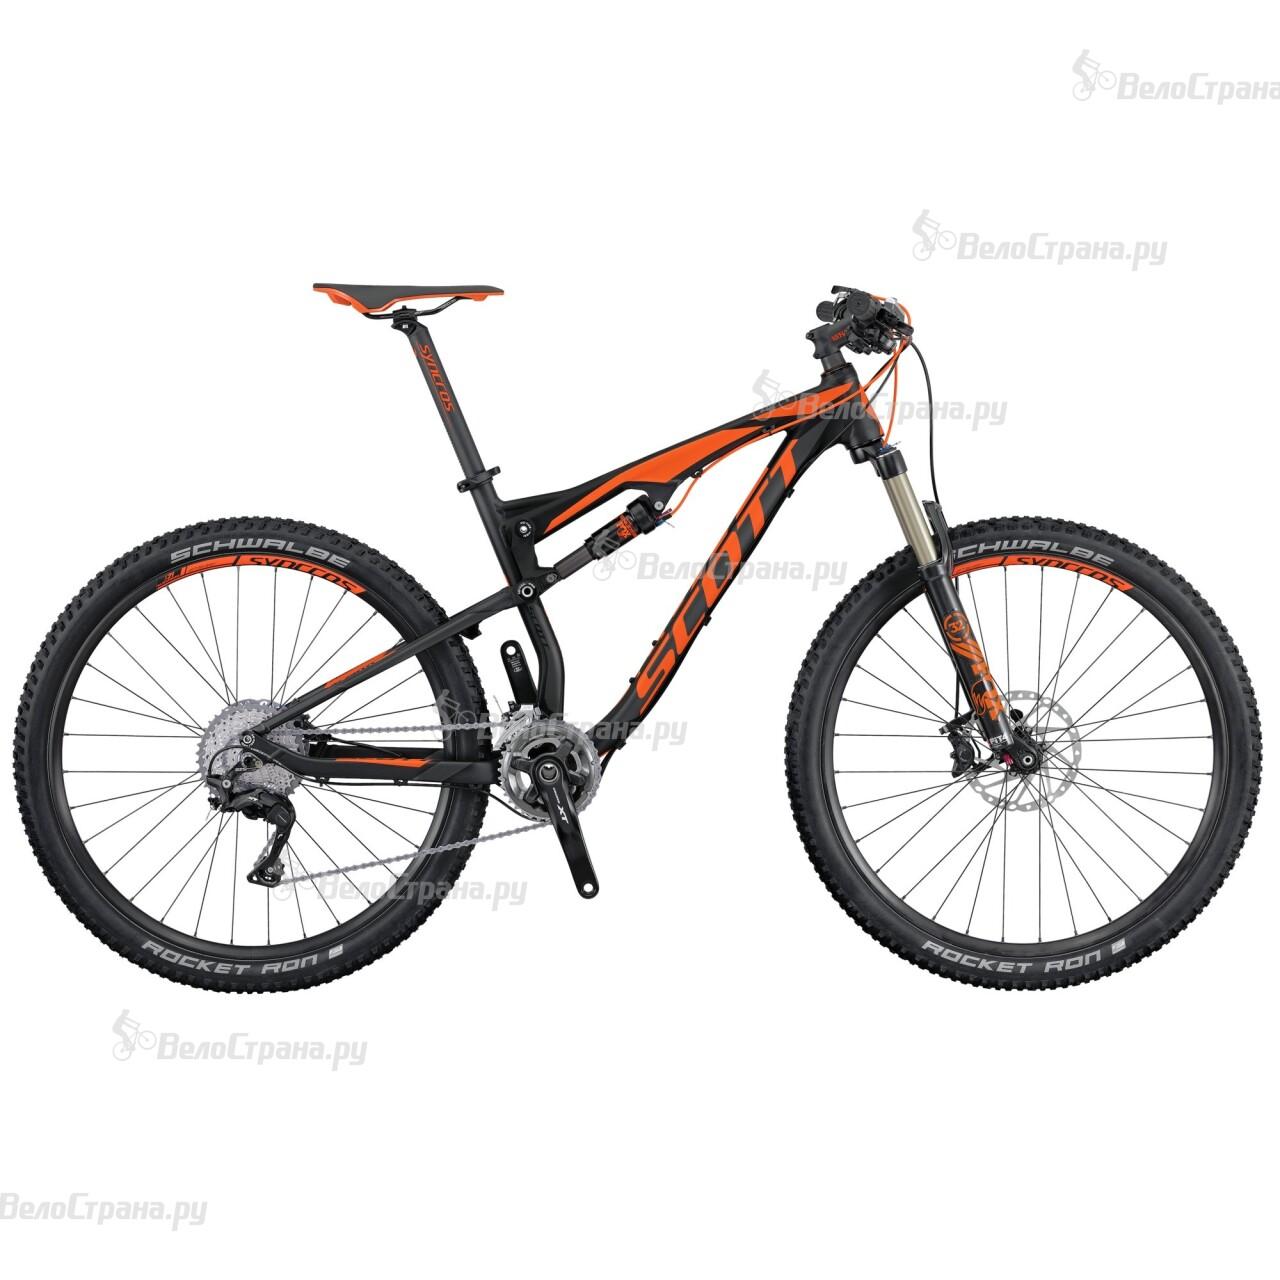 Велосипед Scott Spark 940 (2016) scott spark 740 2017